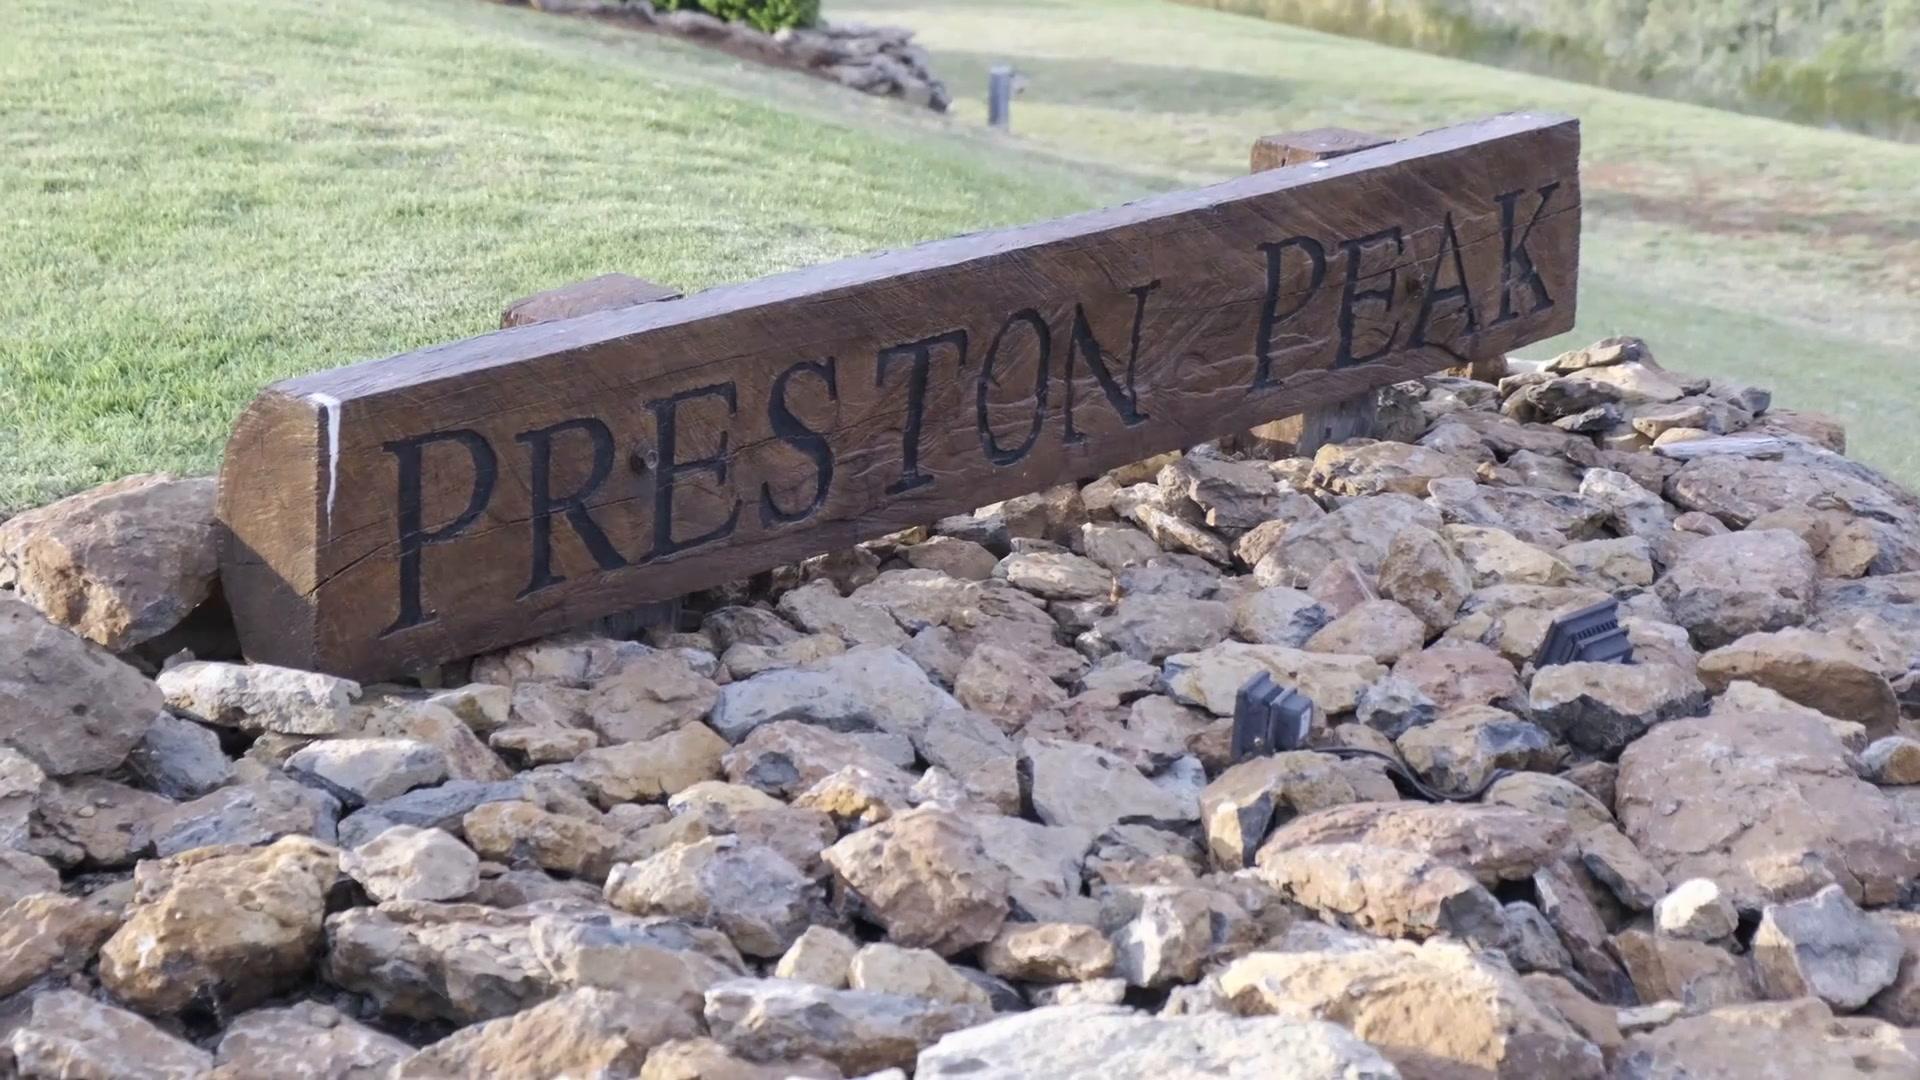 Beau + Shannon | Toowoomba, Australia | Preston Peak Winery